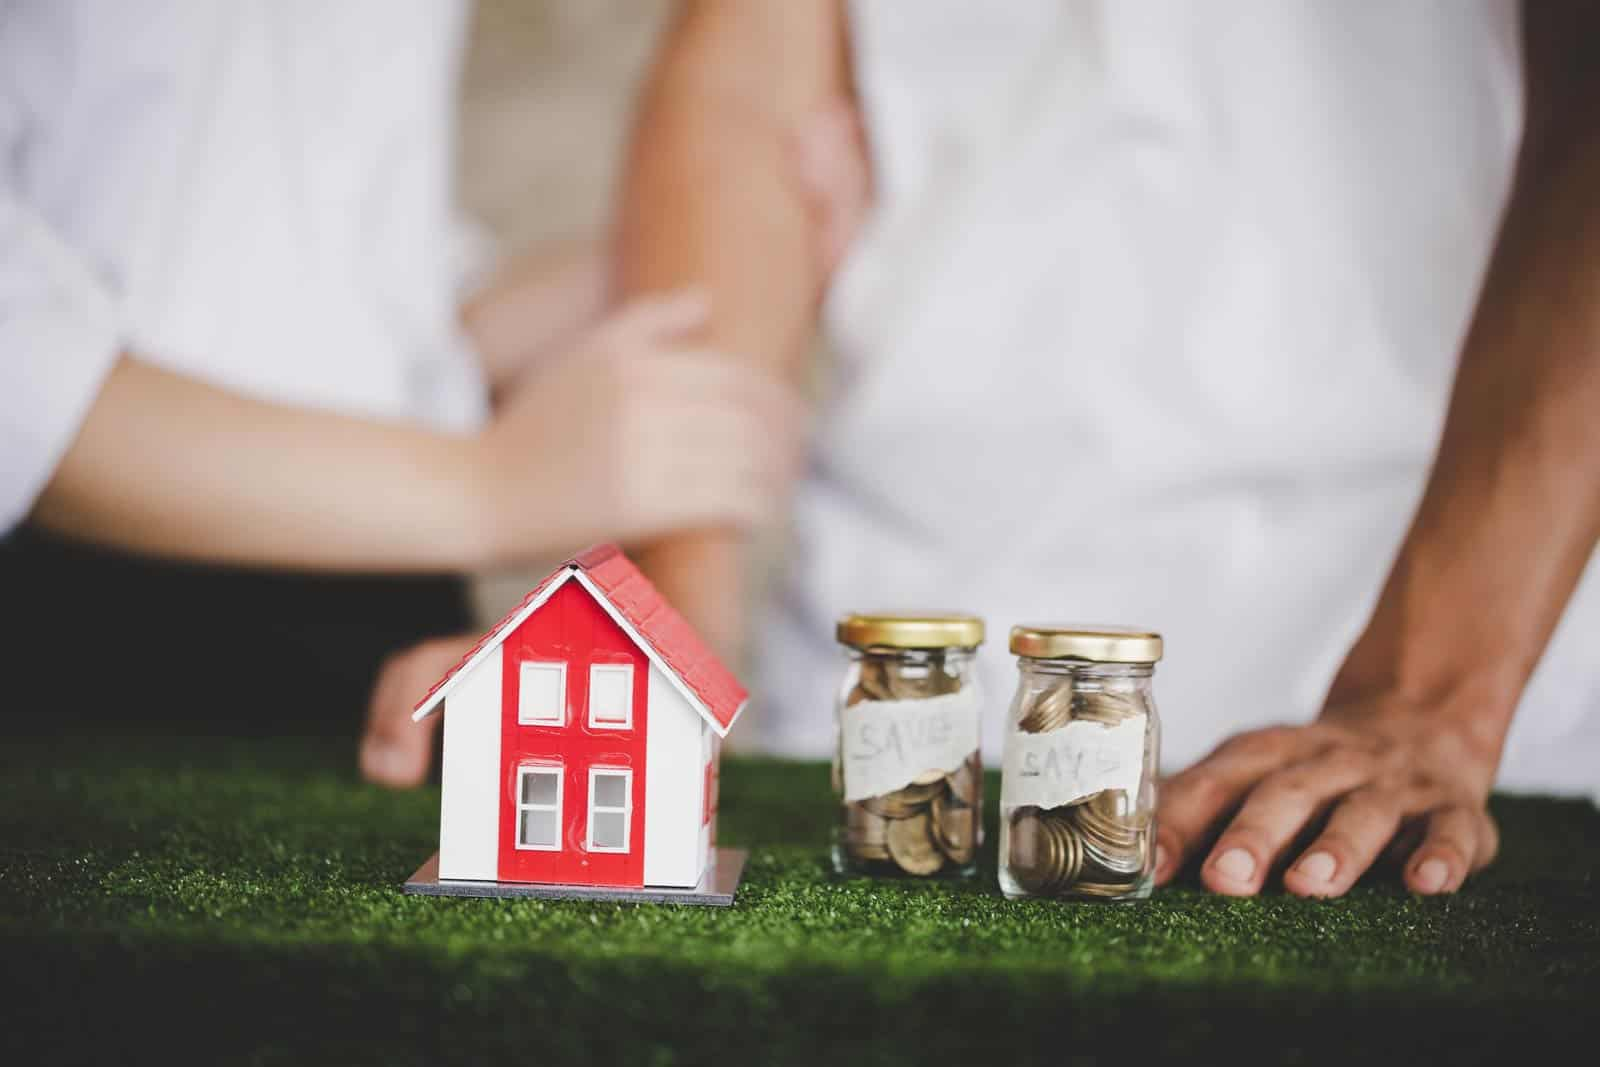 Krediti na 15 godina bez hipoteke